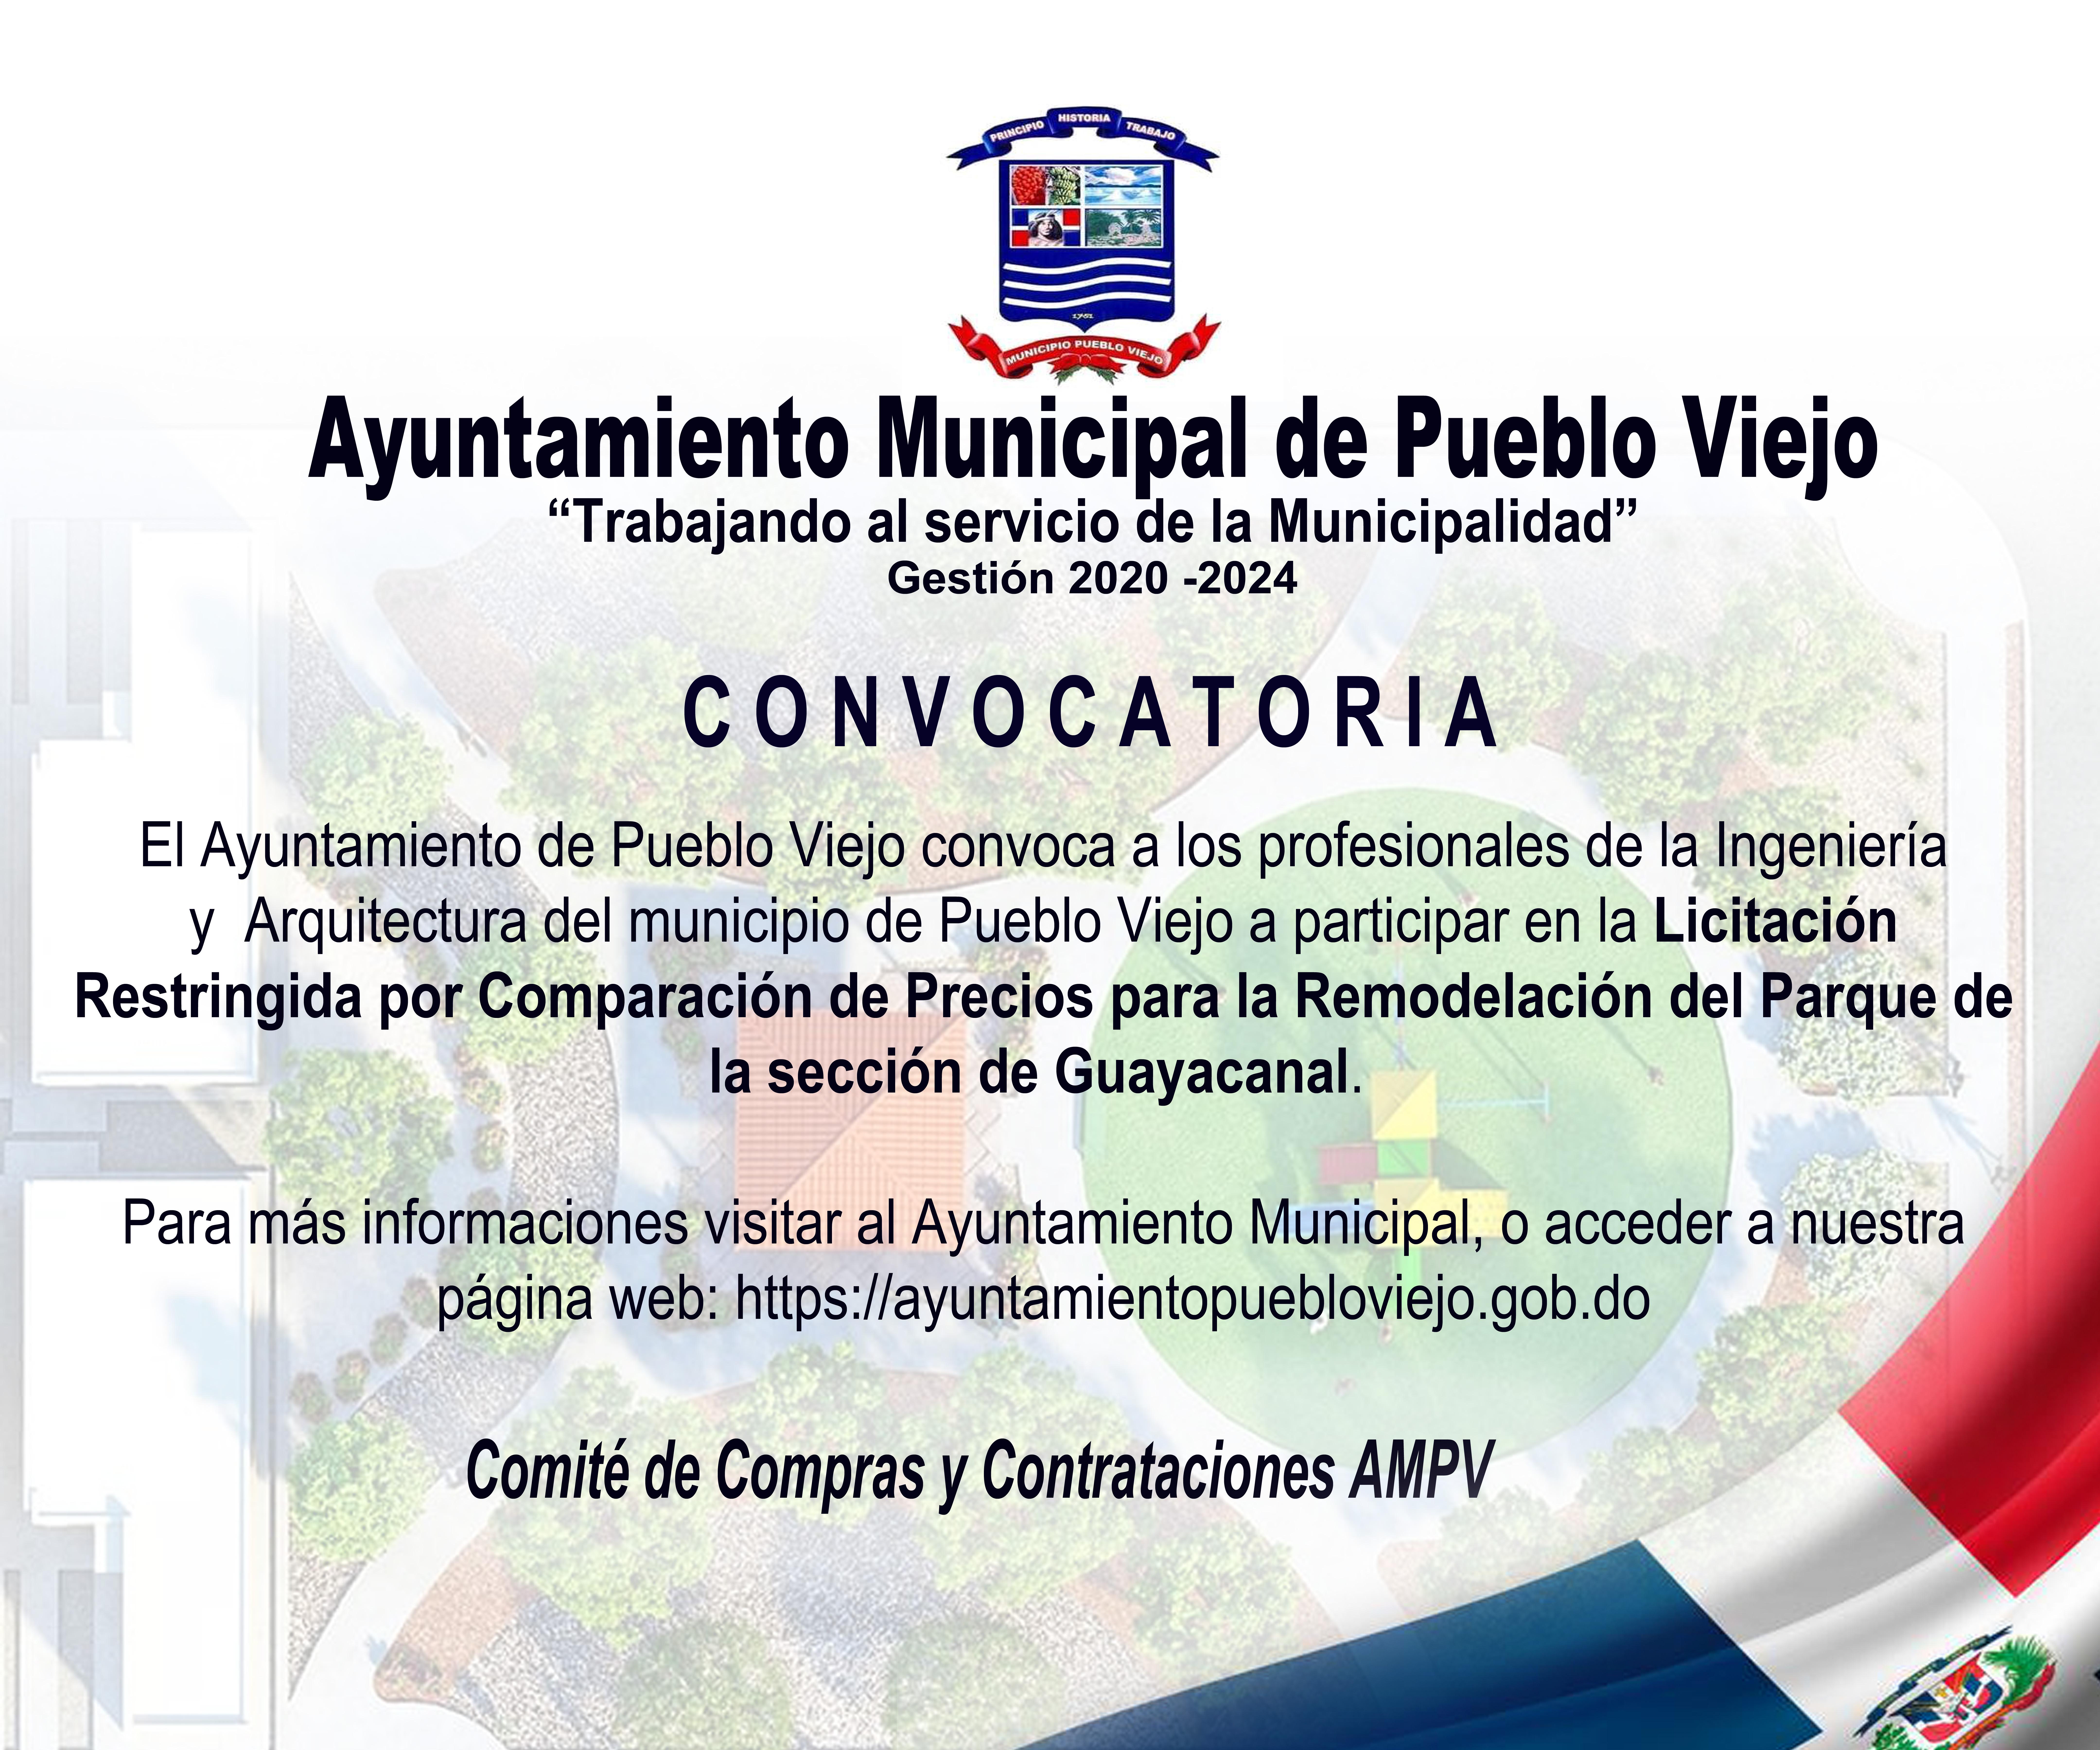 CONVOCATORIA A LICITACION RESTRINGIDA POR COMPARACION DE PRECIOS